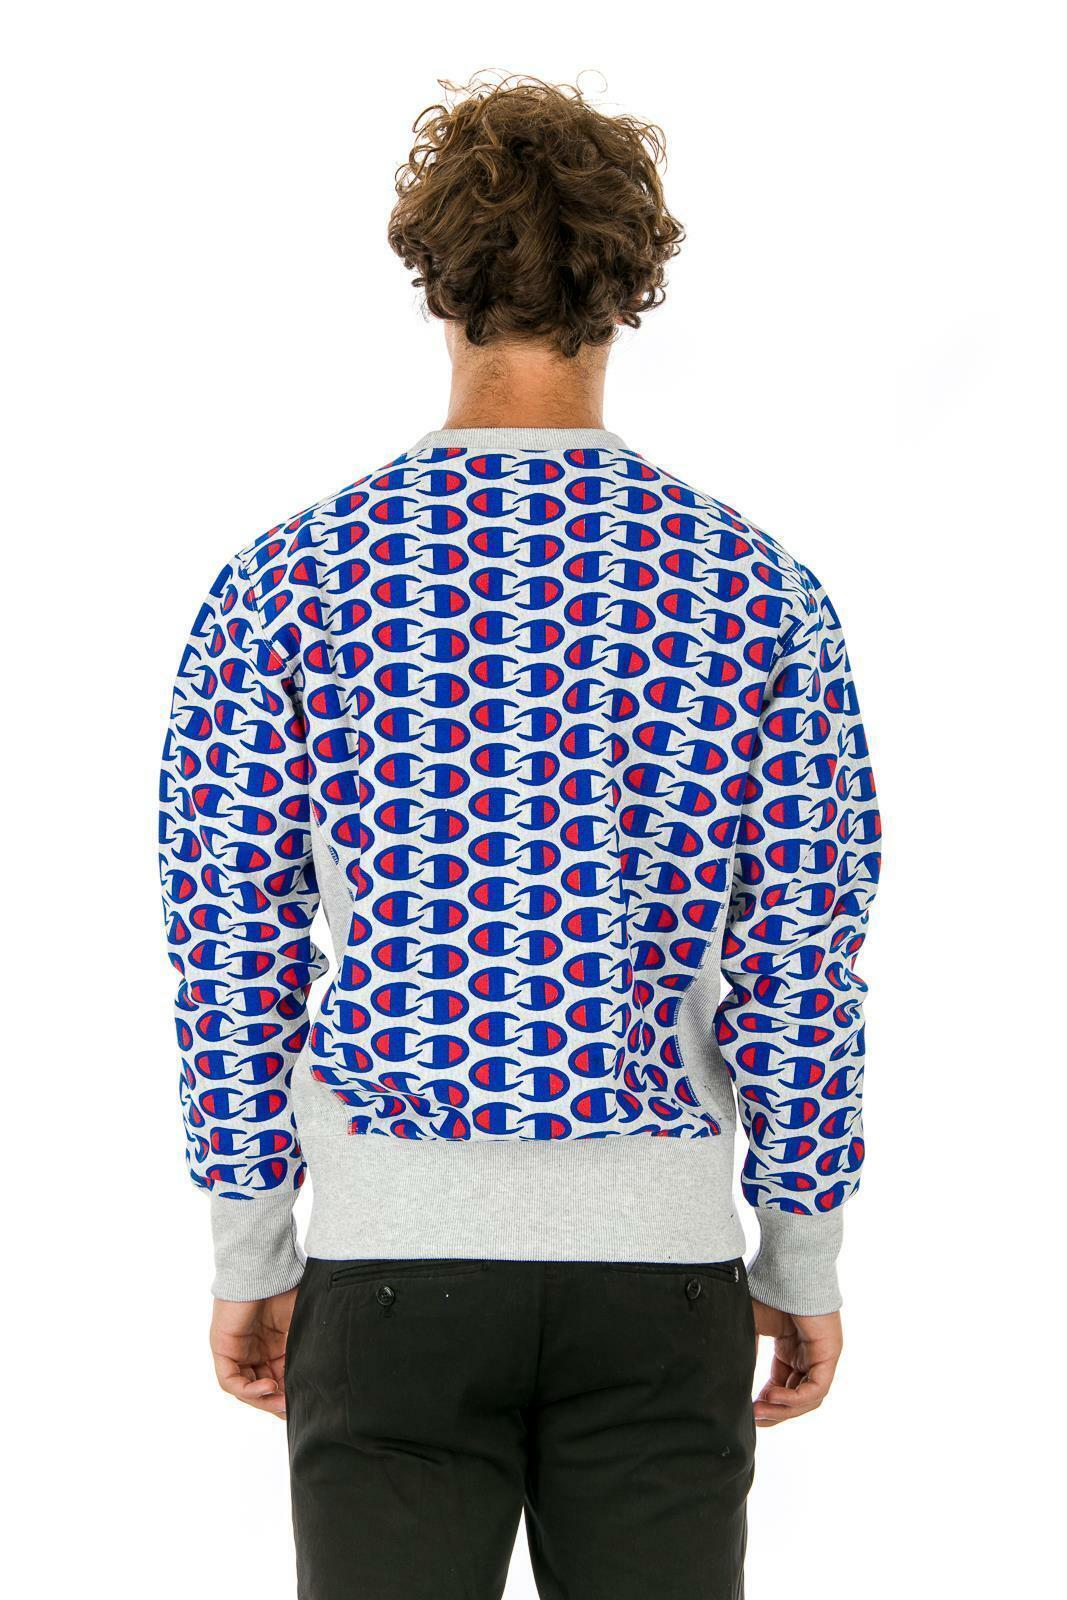 Sale Sweatshirt Champion 212429 Reverse Weave Man Round Neck Grey Blue Fleece Wi image 3